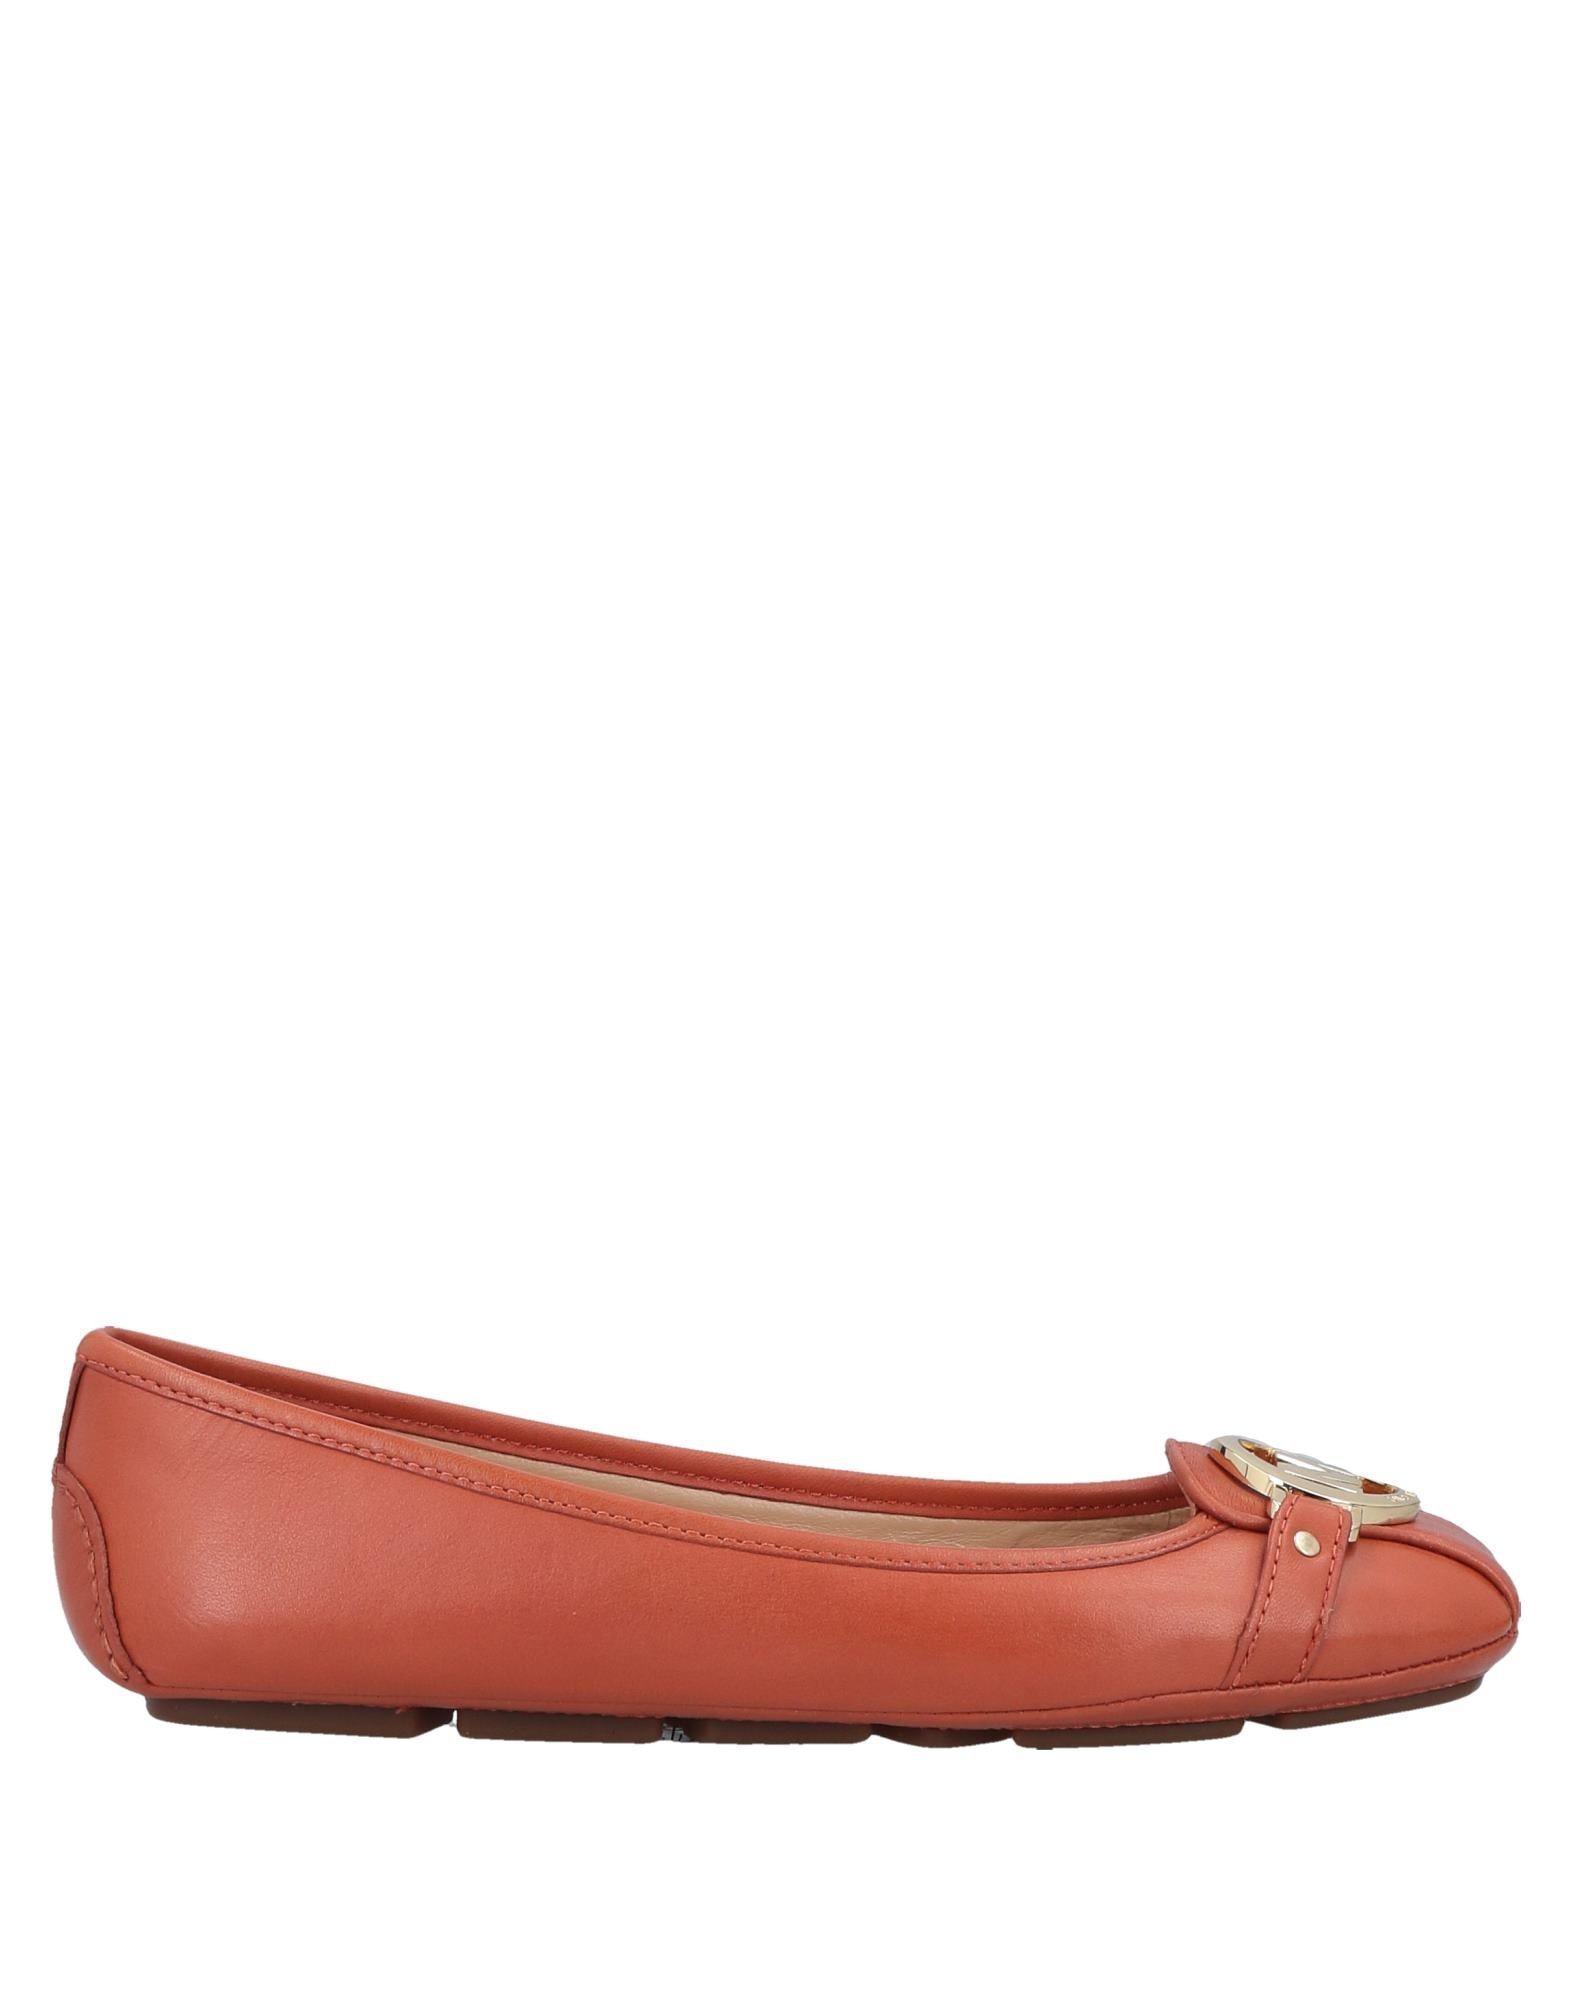 126f112b3d9 MICHAEL Michael Kors. Women s Loafer